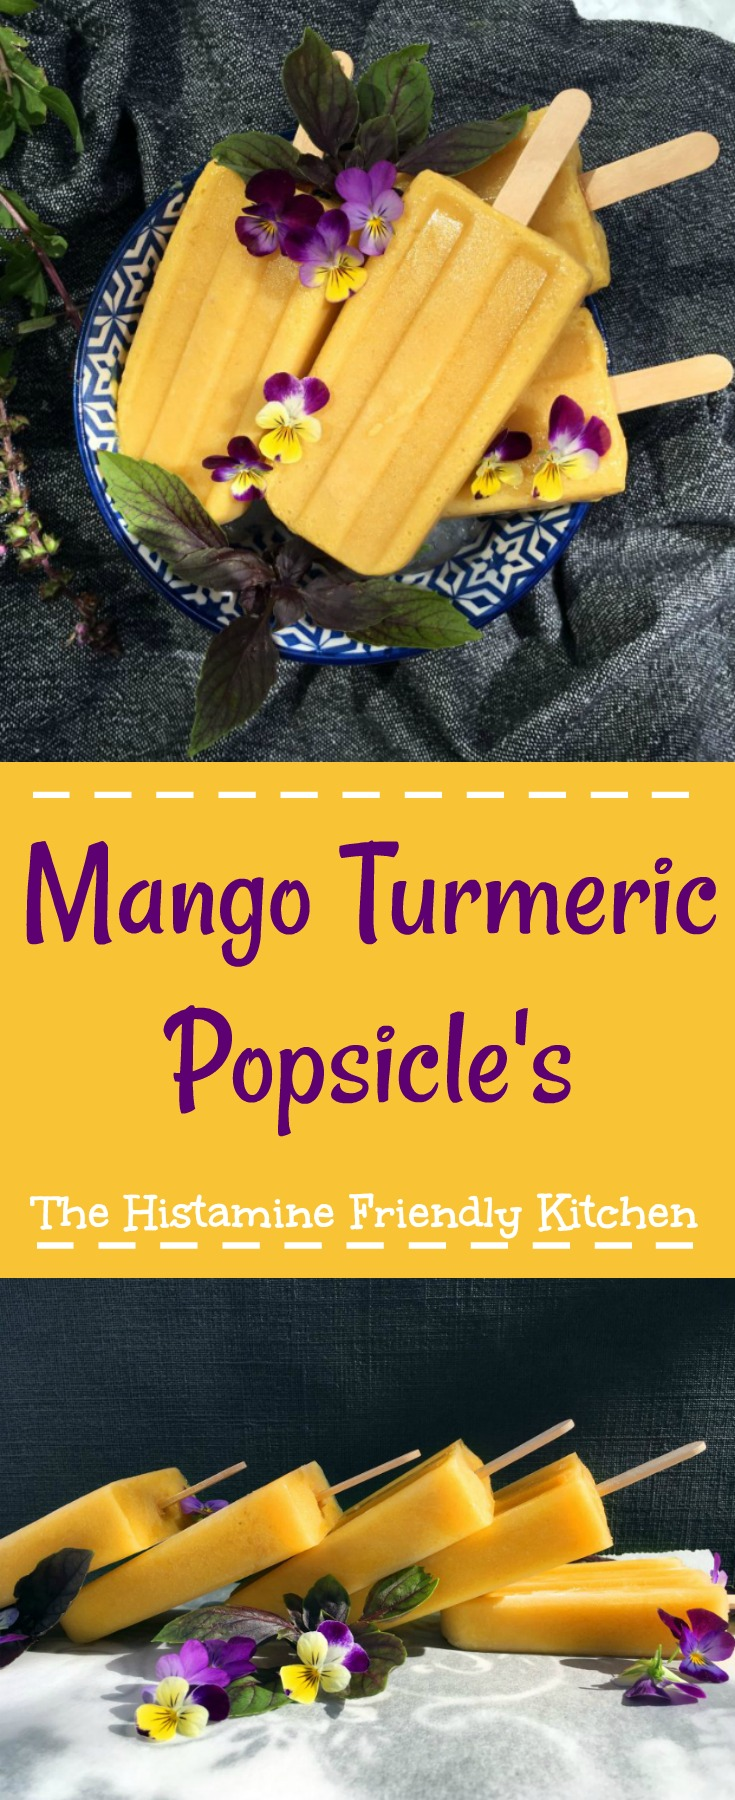 Mango Turmeric Popsicle's